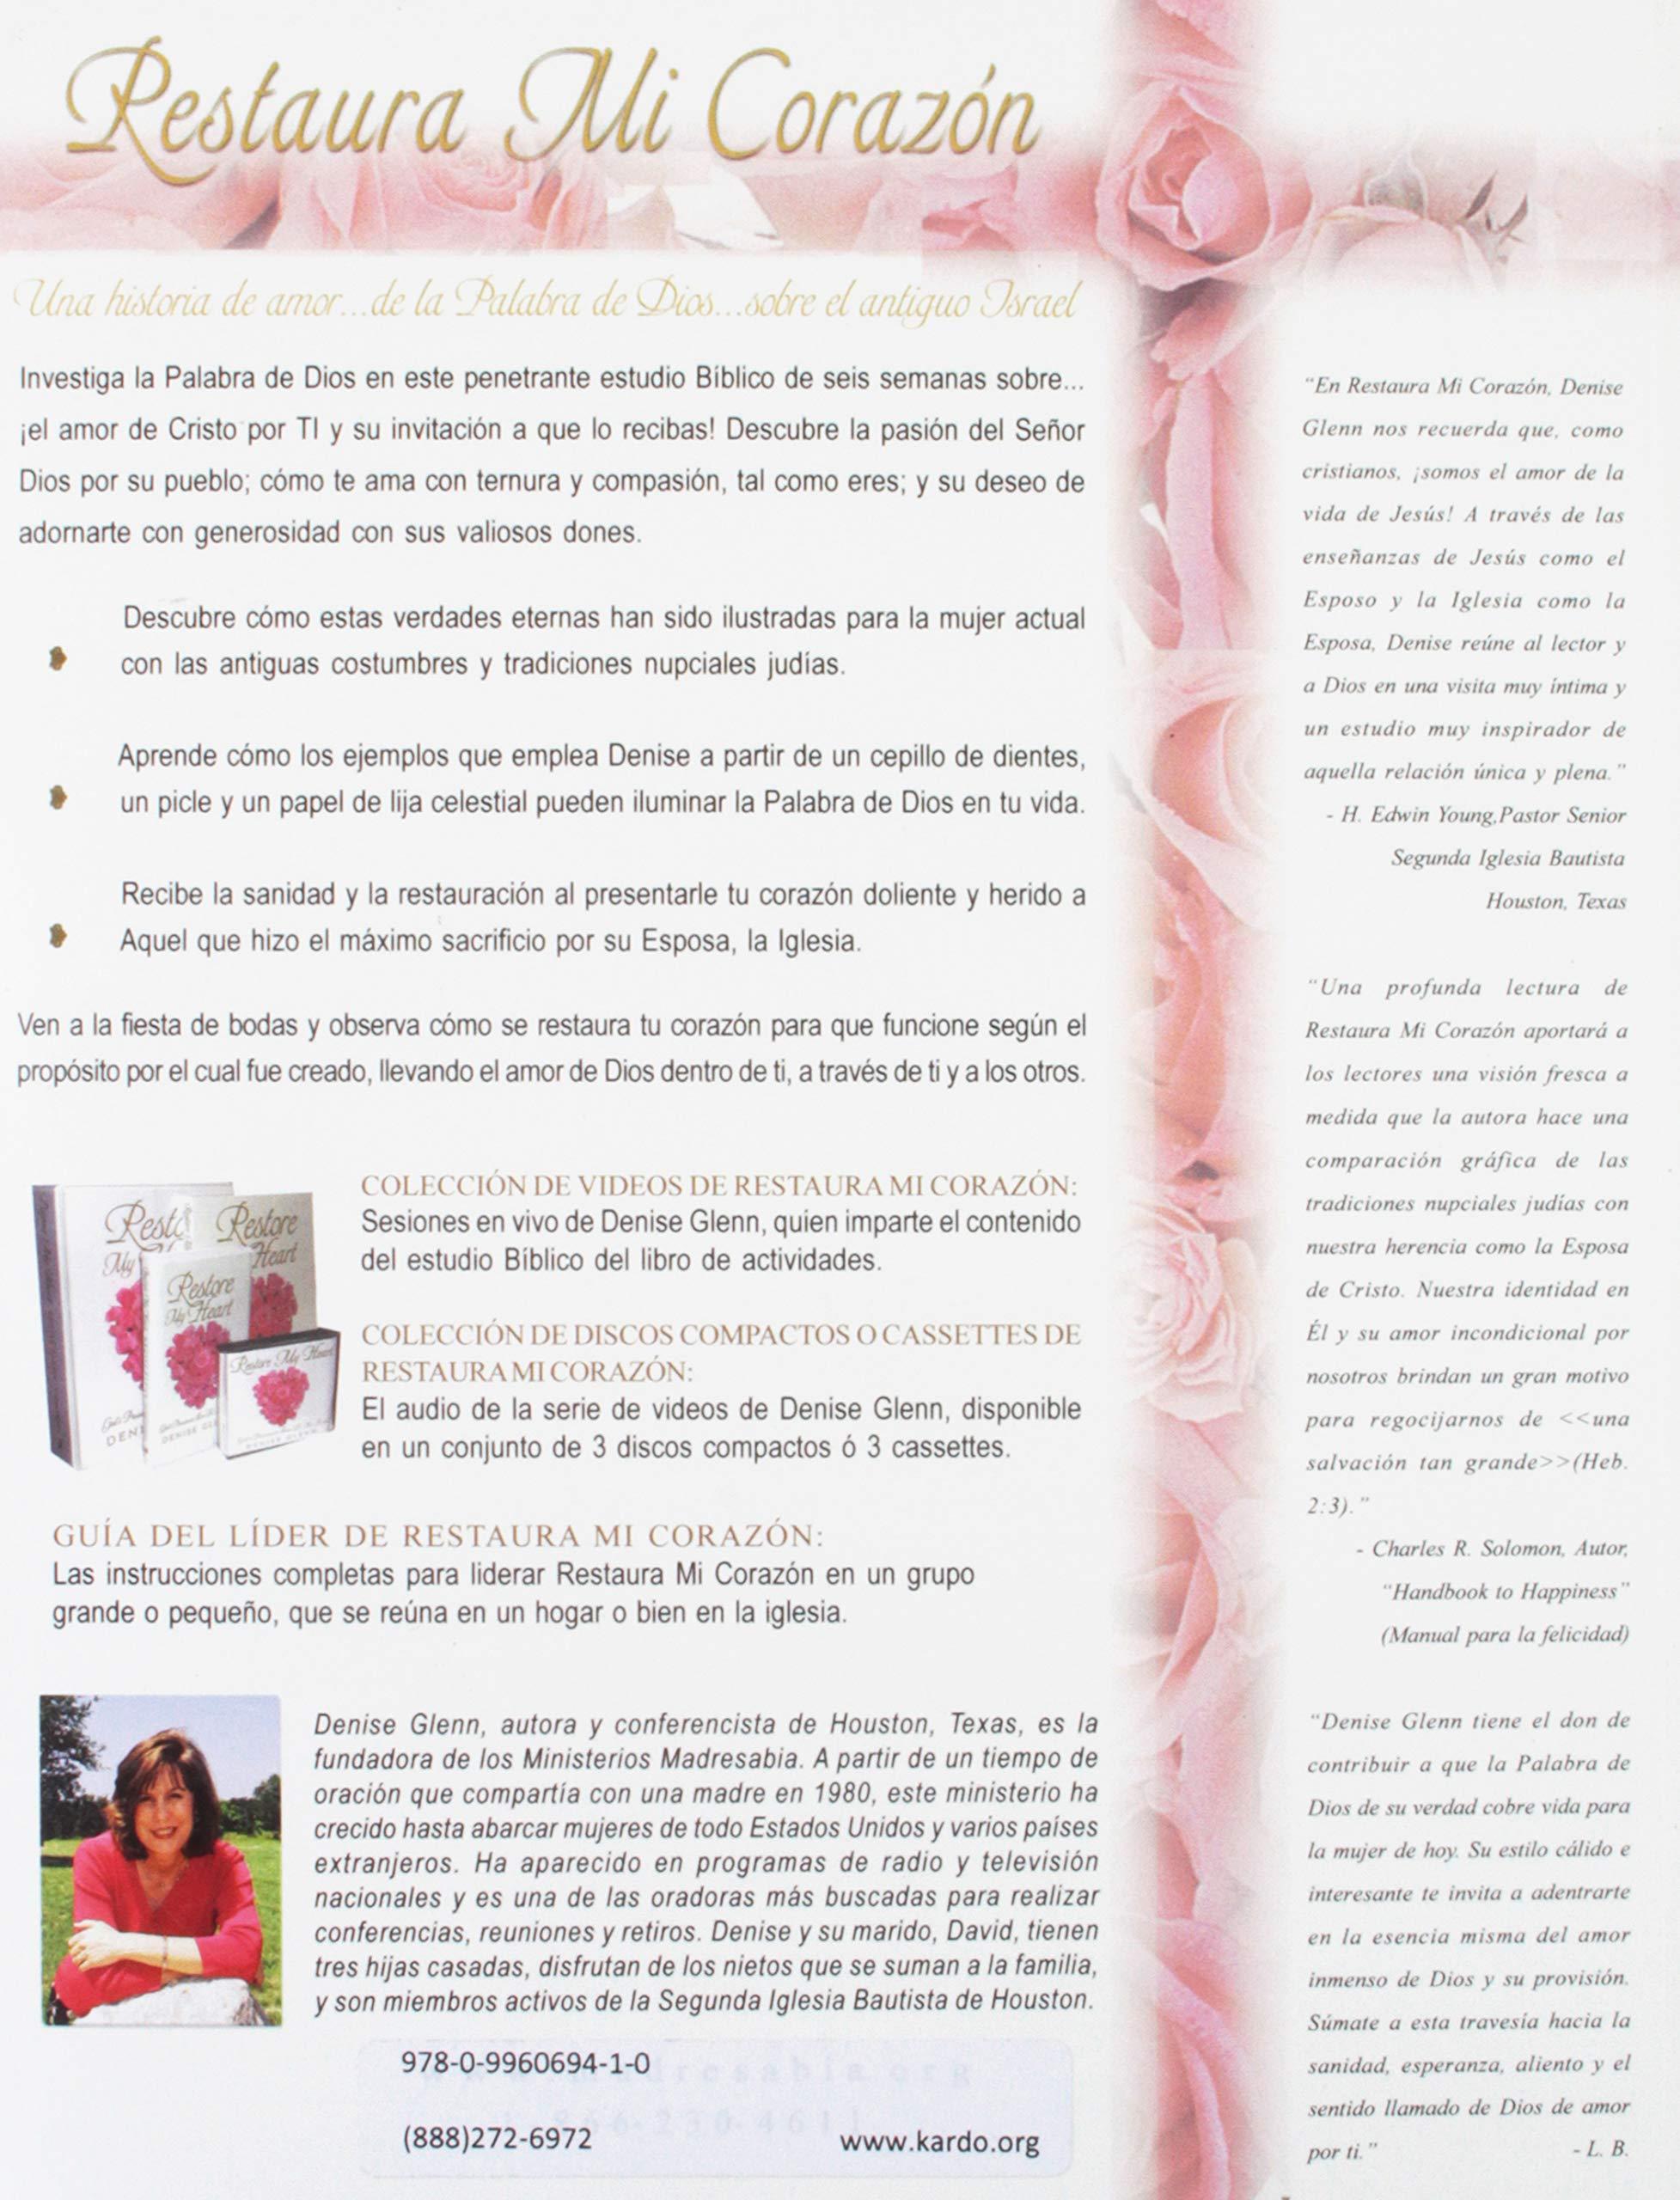 Restaura mi corazón (Spanish Edition): Denise Glenn: 9780996069410: Amazon.com: Books